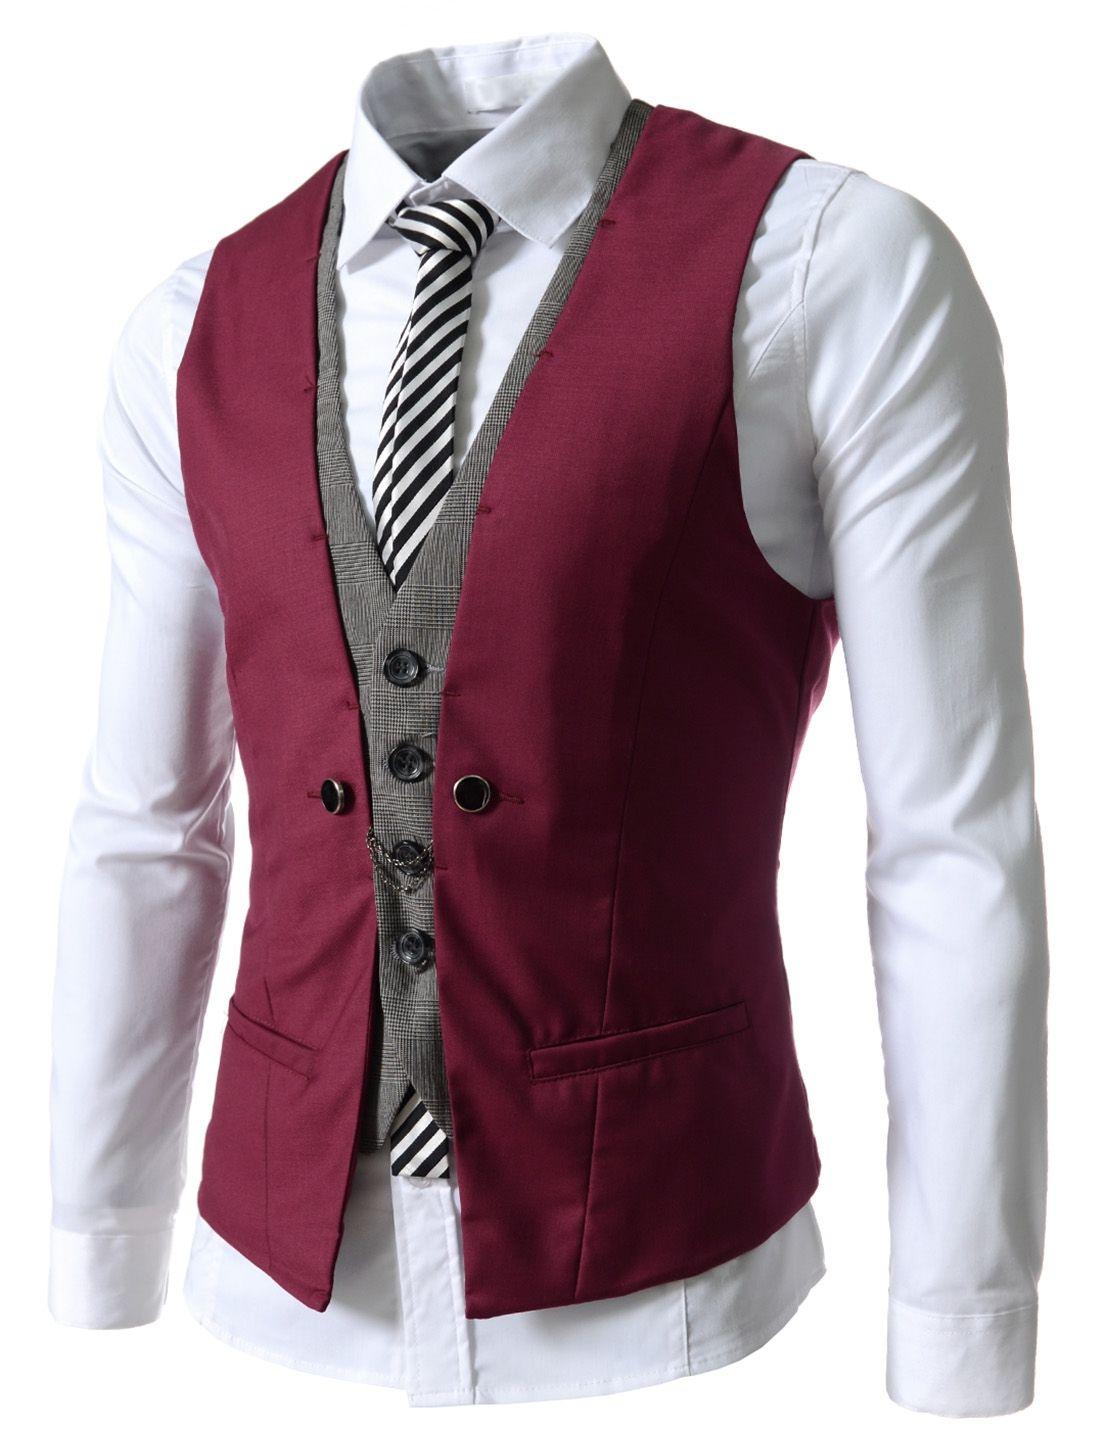 Vests Fast Deliver New Woolen Suit Vest Men 2018 Fashion Single Breasted Wool Vest Waistcoat Mens Slim Wedding Business Tuxedo Vests Gilet Homme Up-To-Date Styling